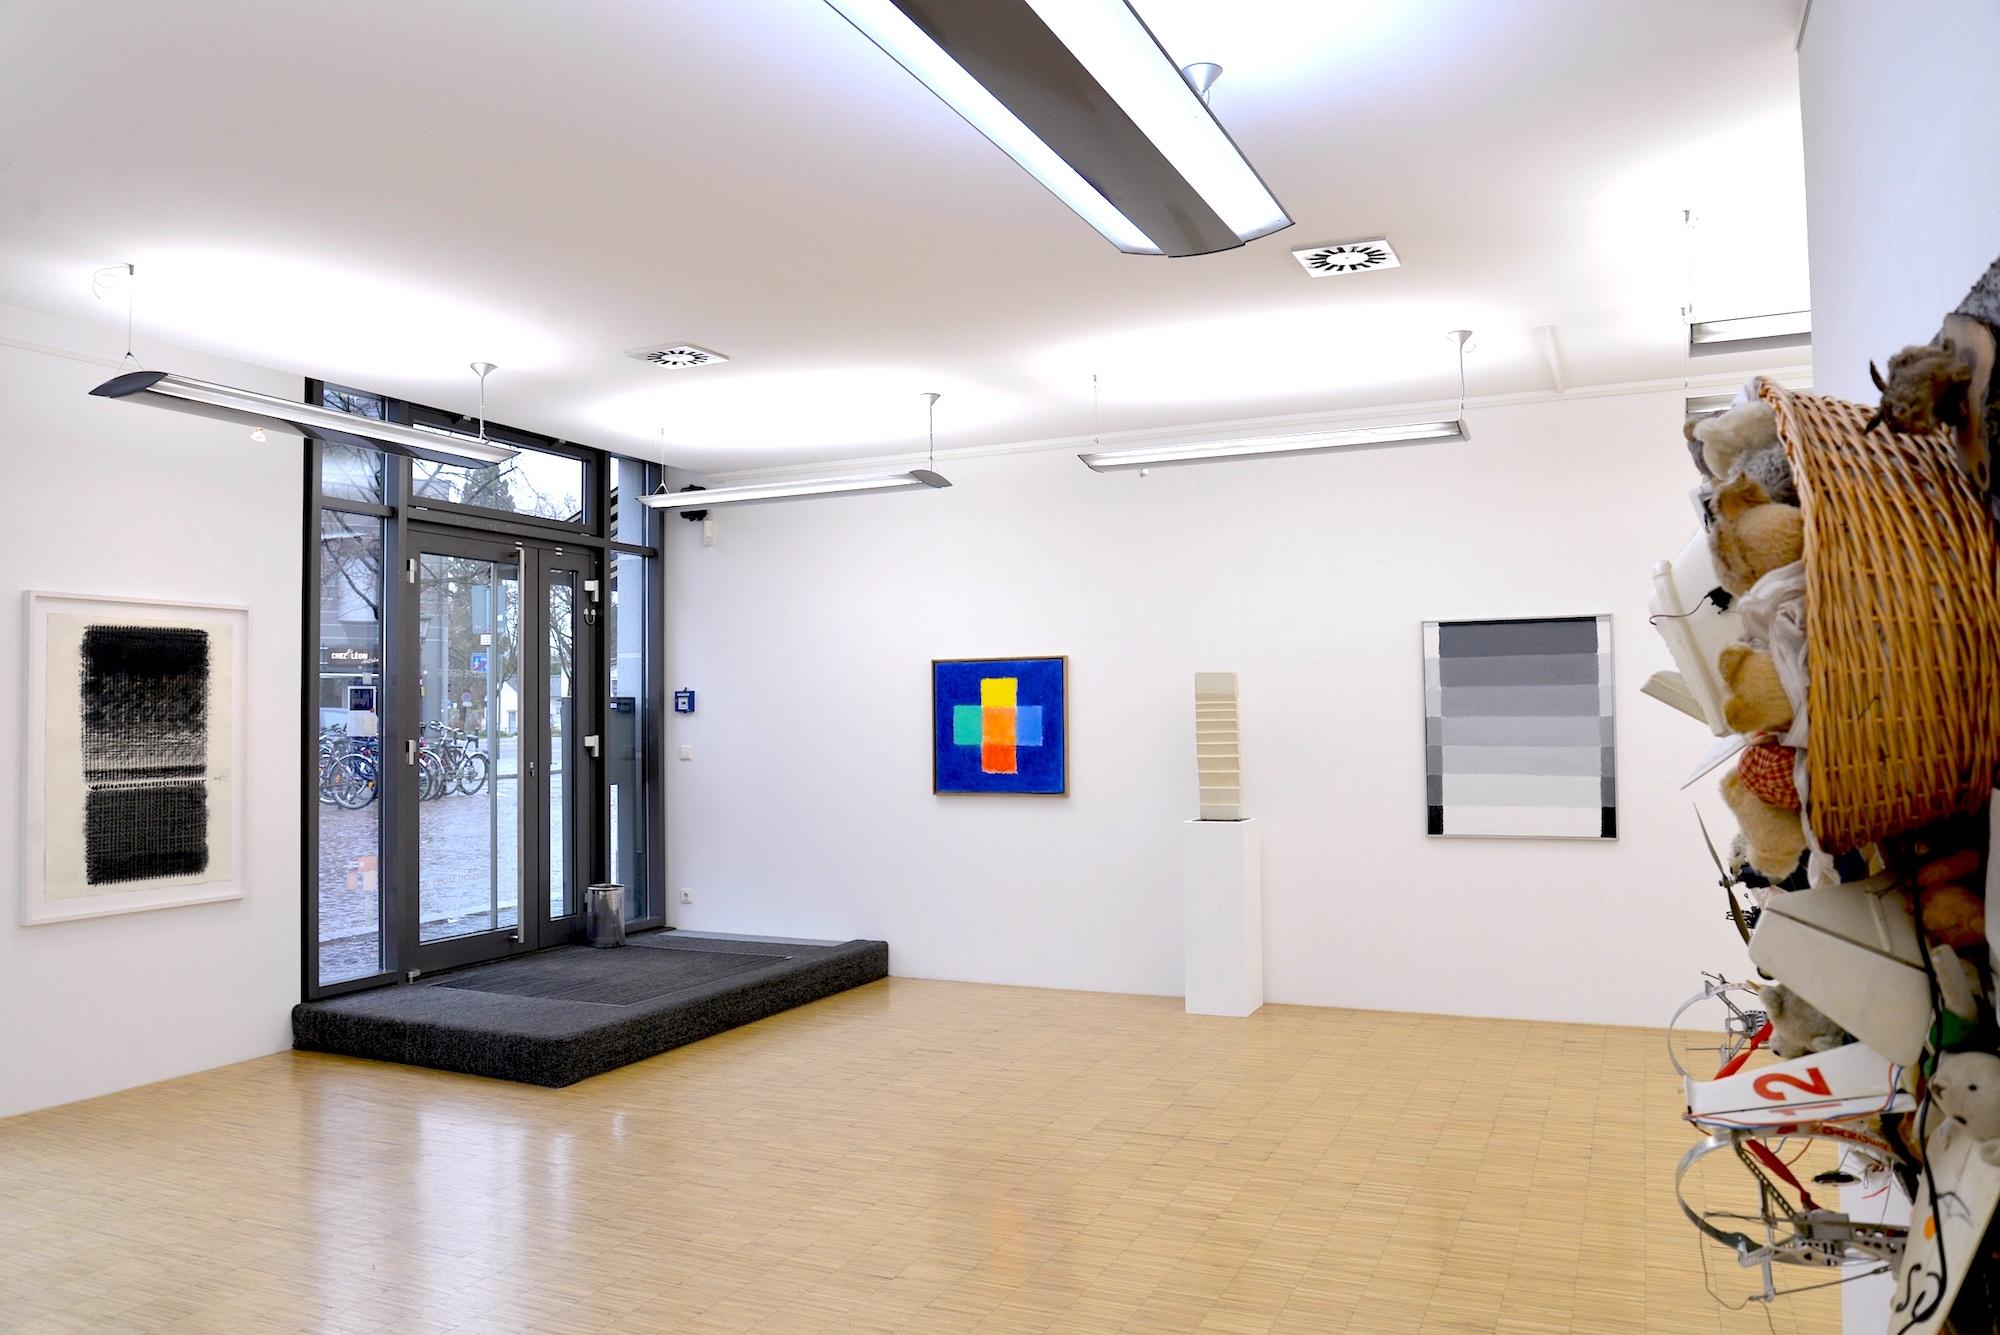 Zentral & nah: Die Galerie Geiger